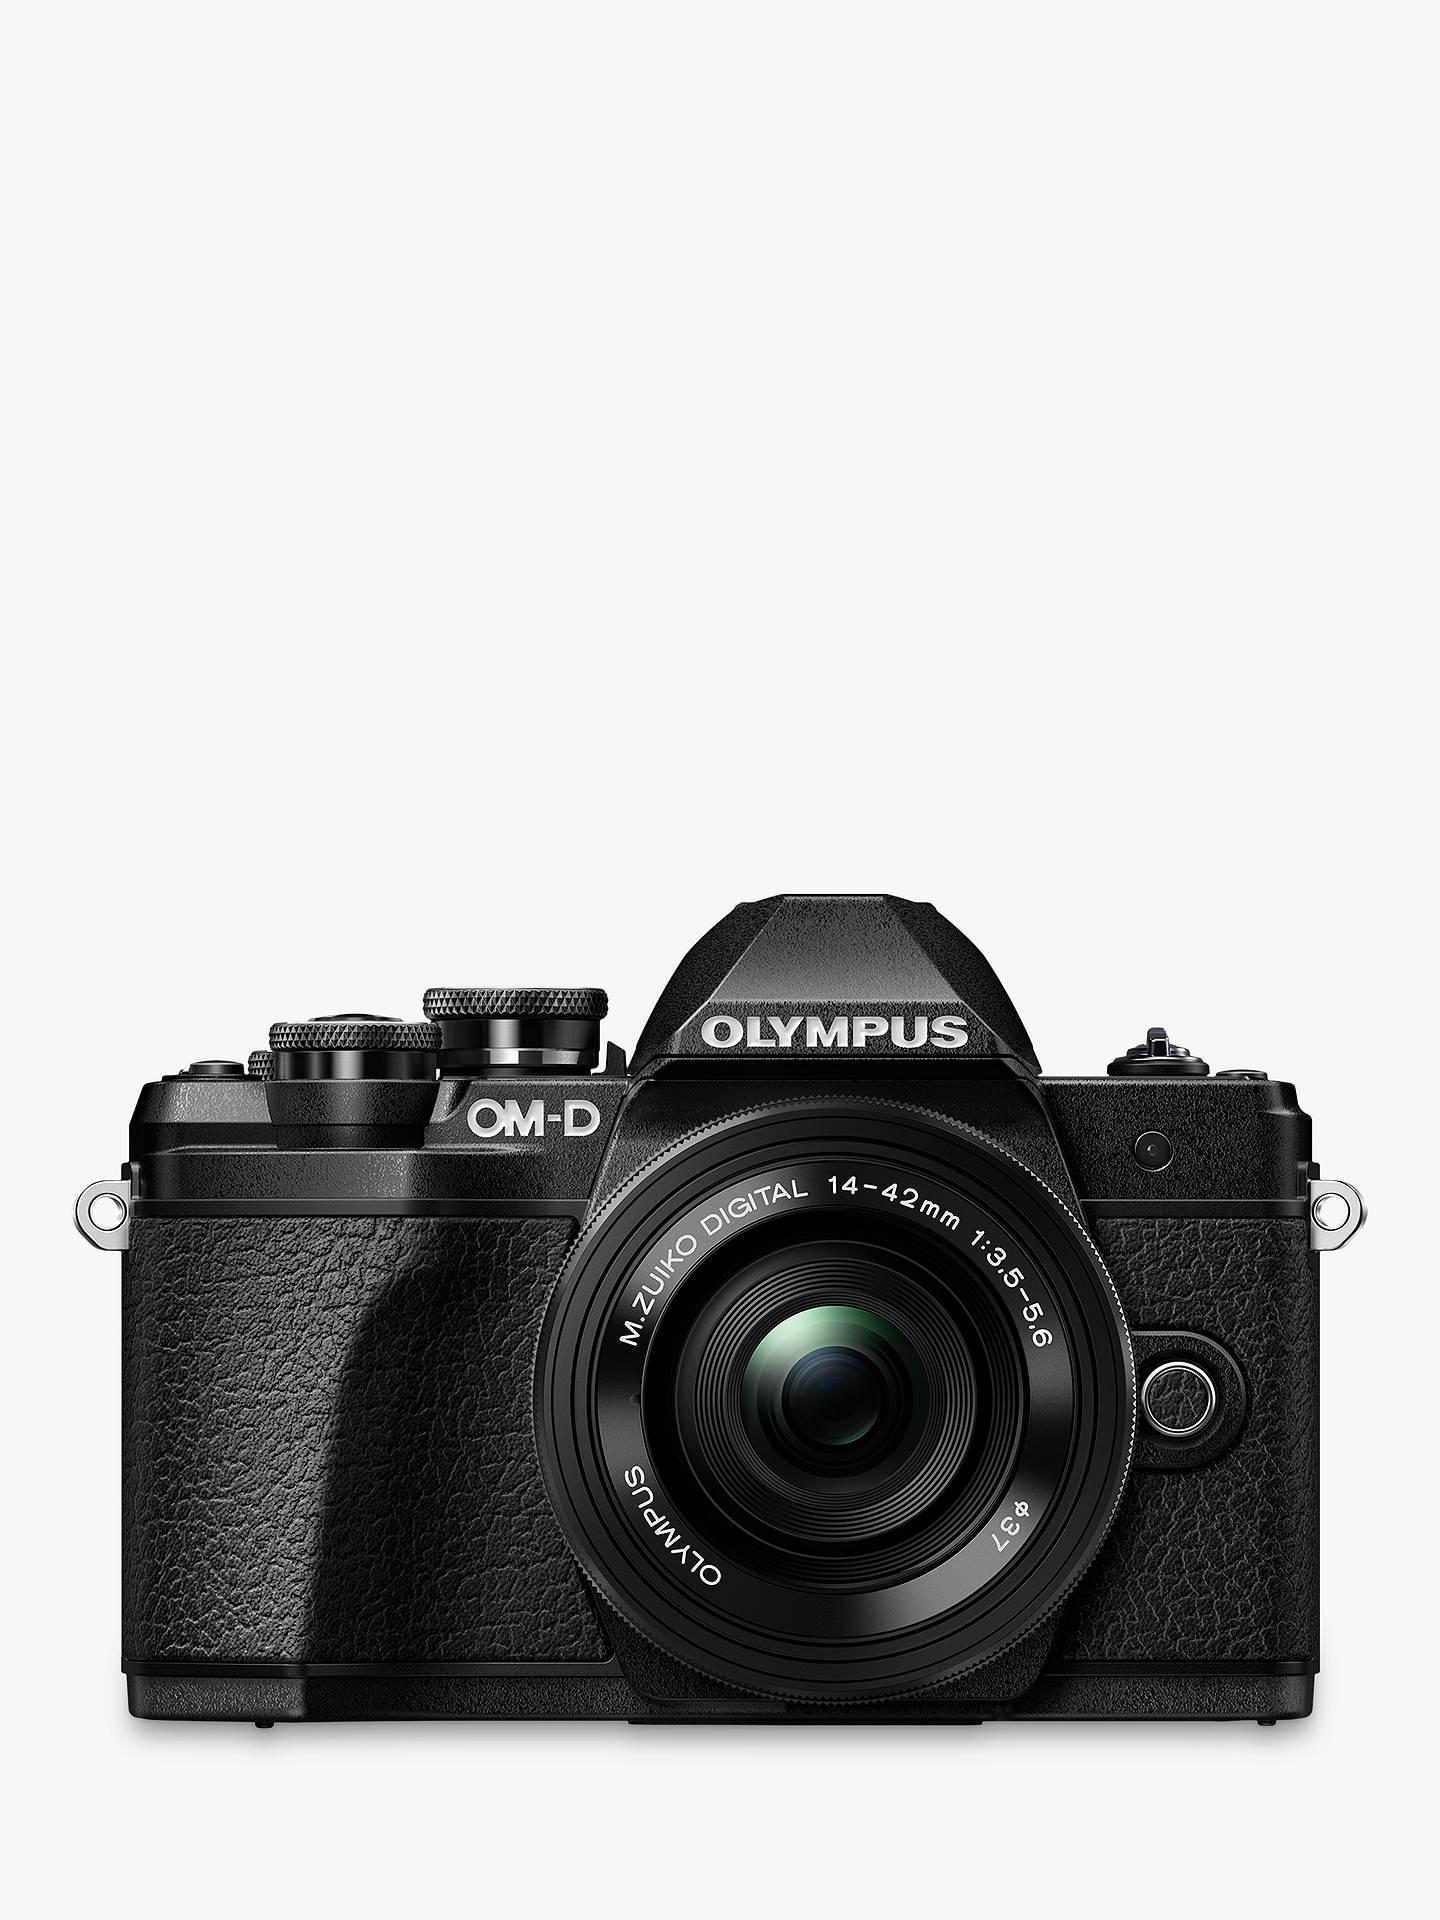 Olympus OMD M10 Mk3 with 14-42mm kit lens £214.98 @ John Lewis & Partners (Nottingham)